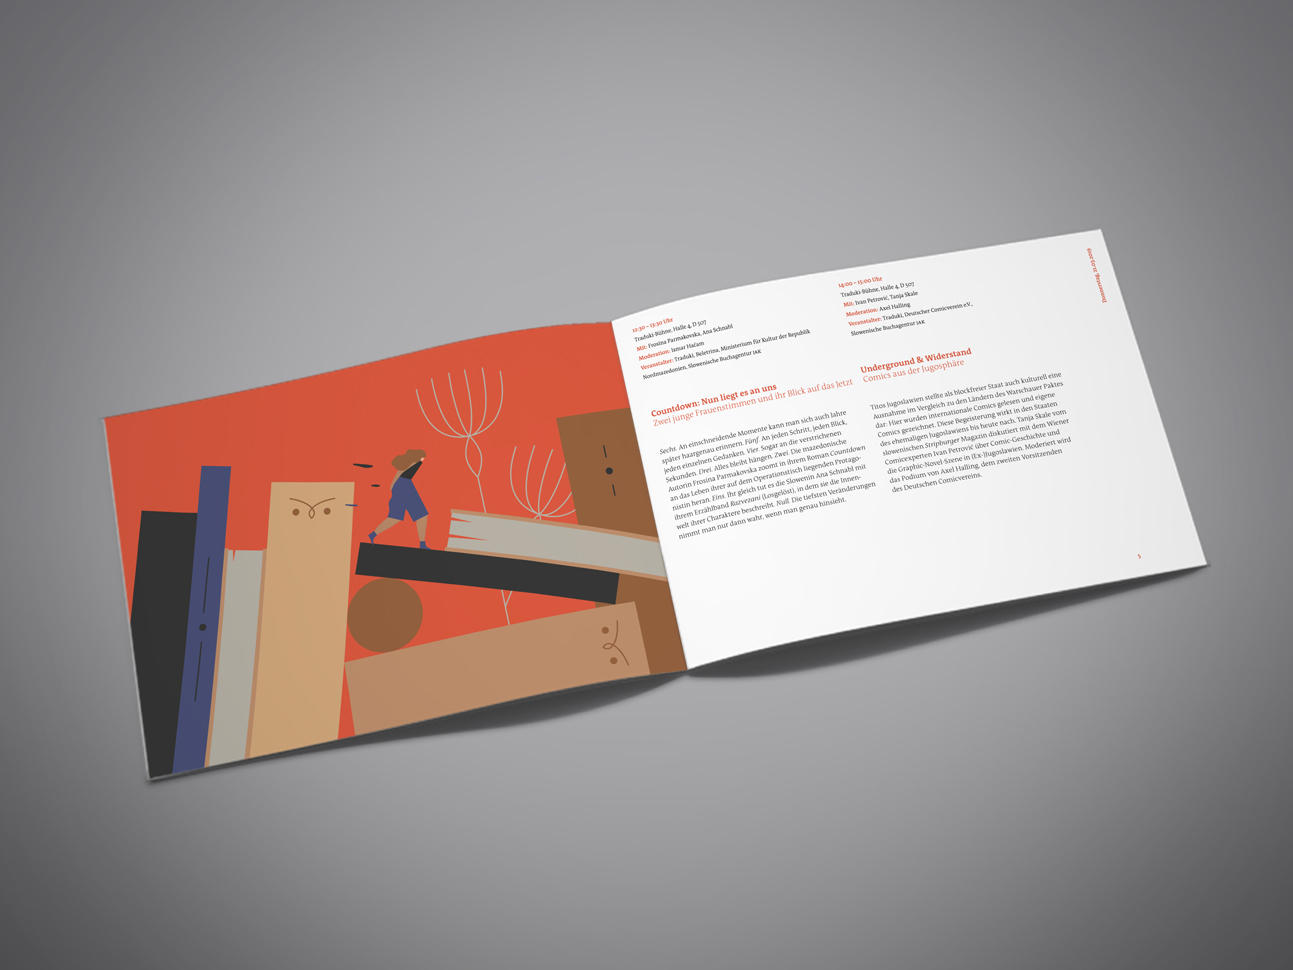 martin zech design, projekt design, traduki, messestand, leipziger buchmesse, 2019, programmheft, doppelseite 1